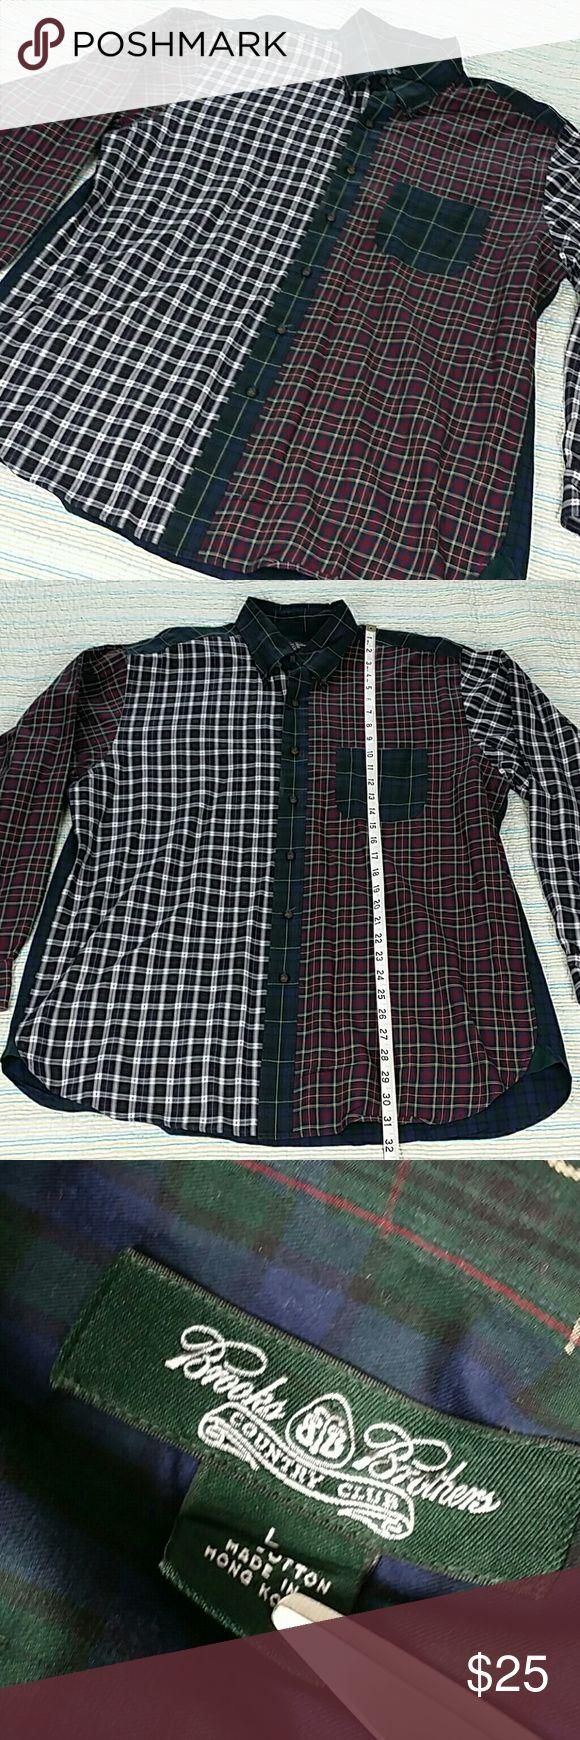 Brooks Brothers Country Club Plaid Shirt Sz XL Brooks Brothers Country Club Casual Shirt Green Navy Blue Burgandy Plaid Sz XL Brooks Brothers Shirts Casual Button Down Shirts